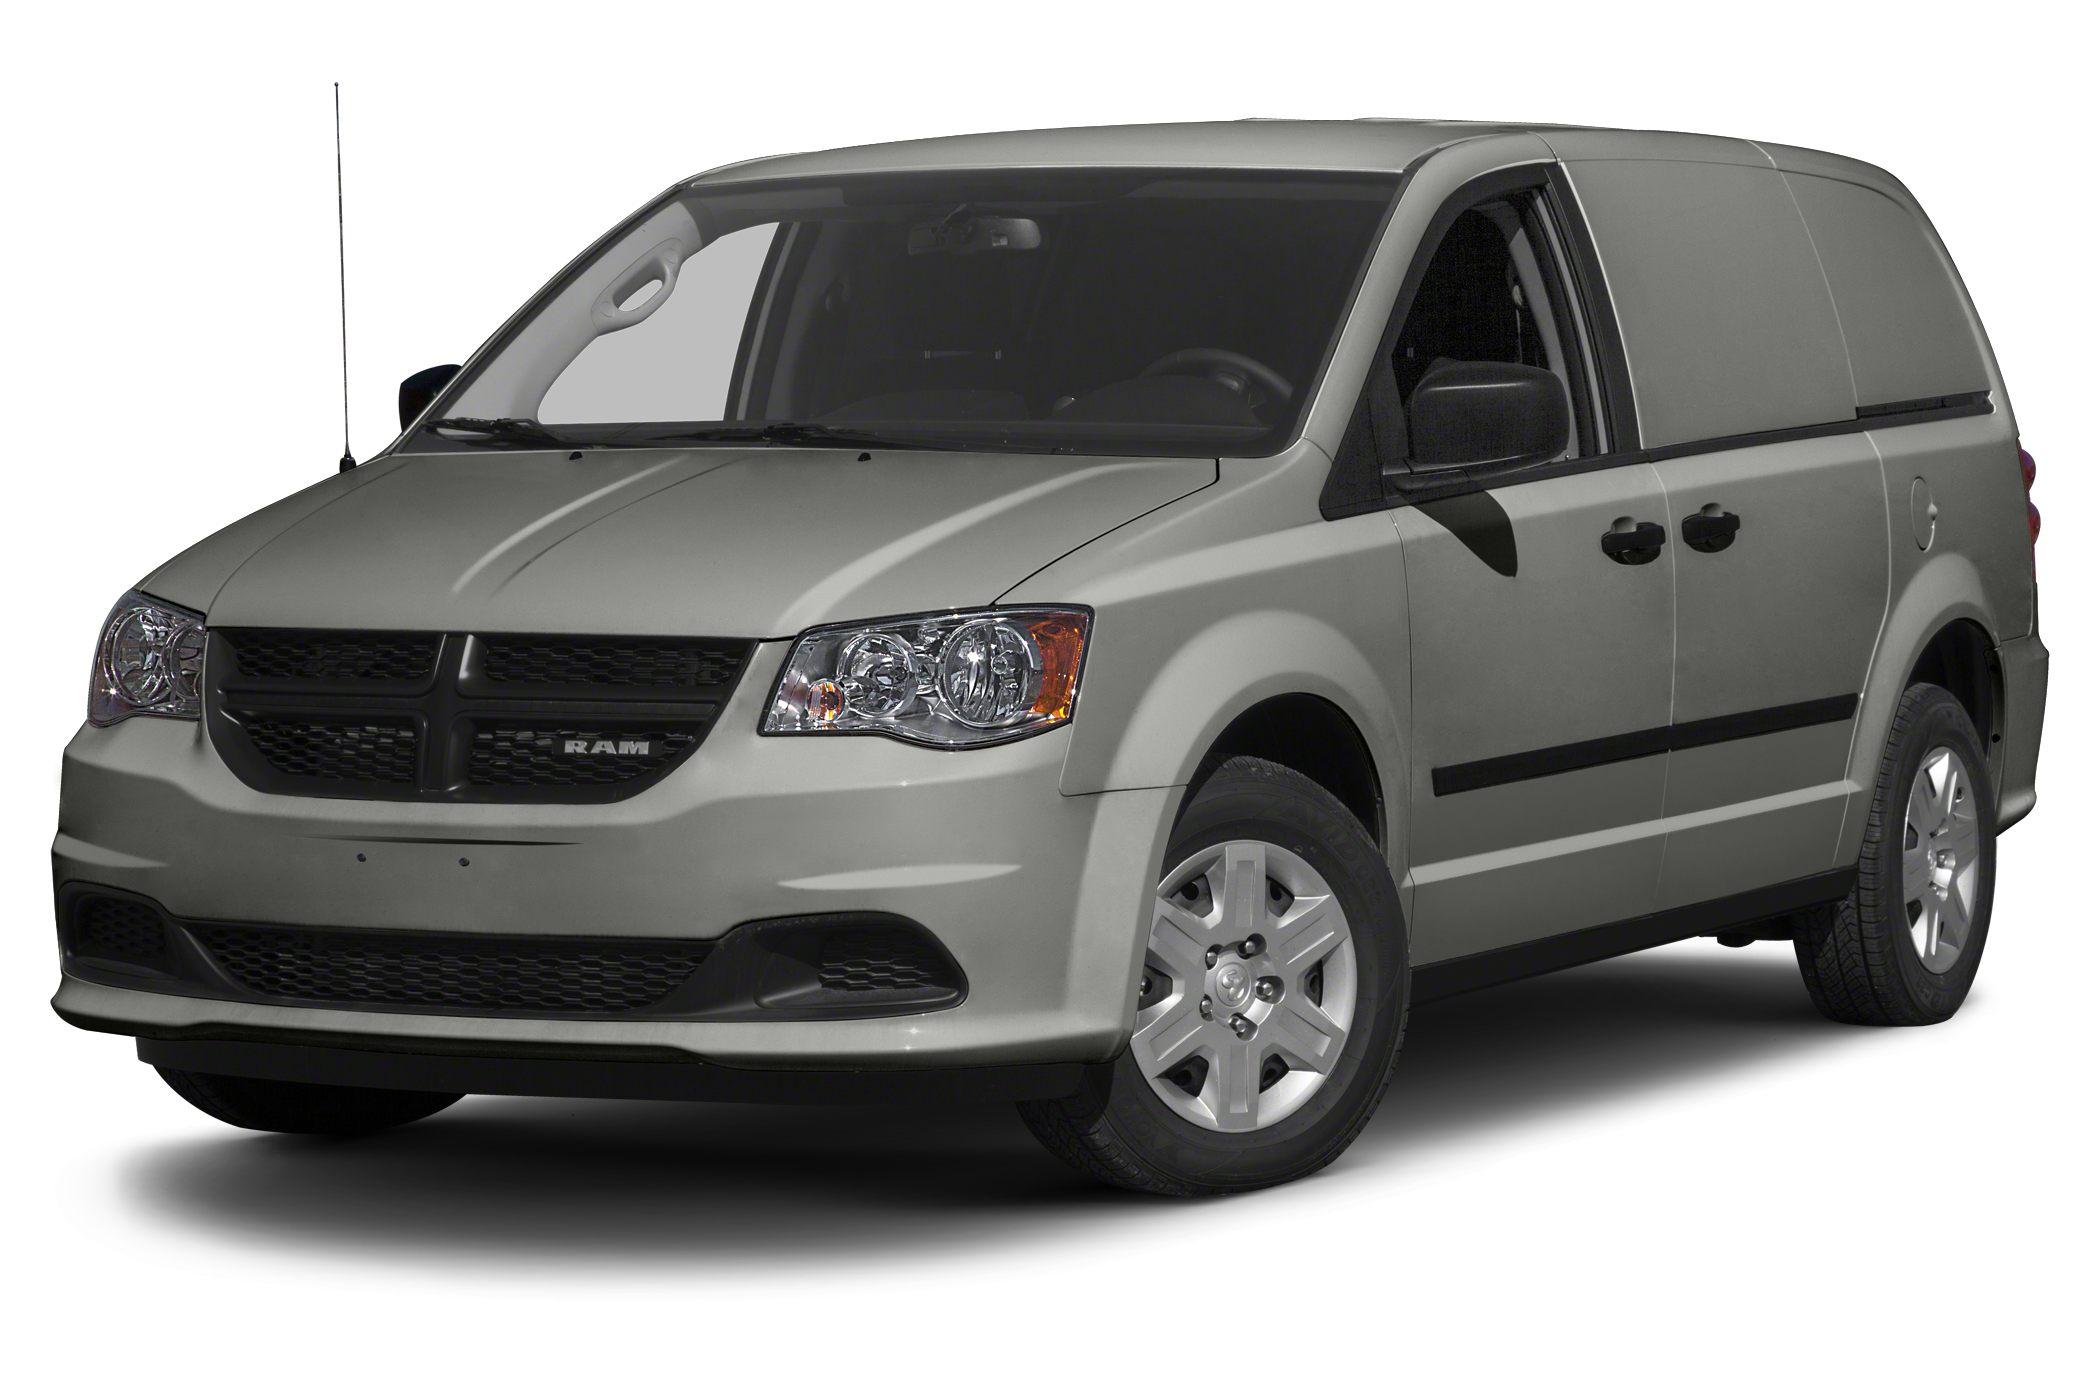 2013 RAM Cargo Tradesman Cargo Van for sale in Orlando for $22,935 with 13 miles.